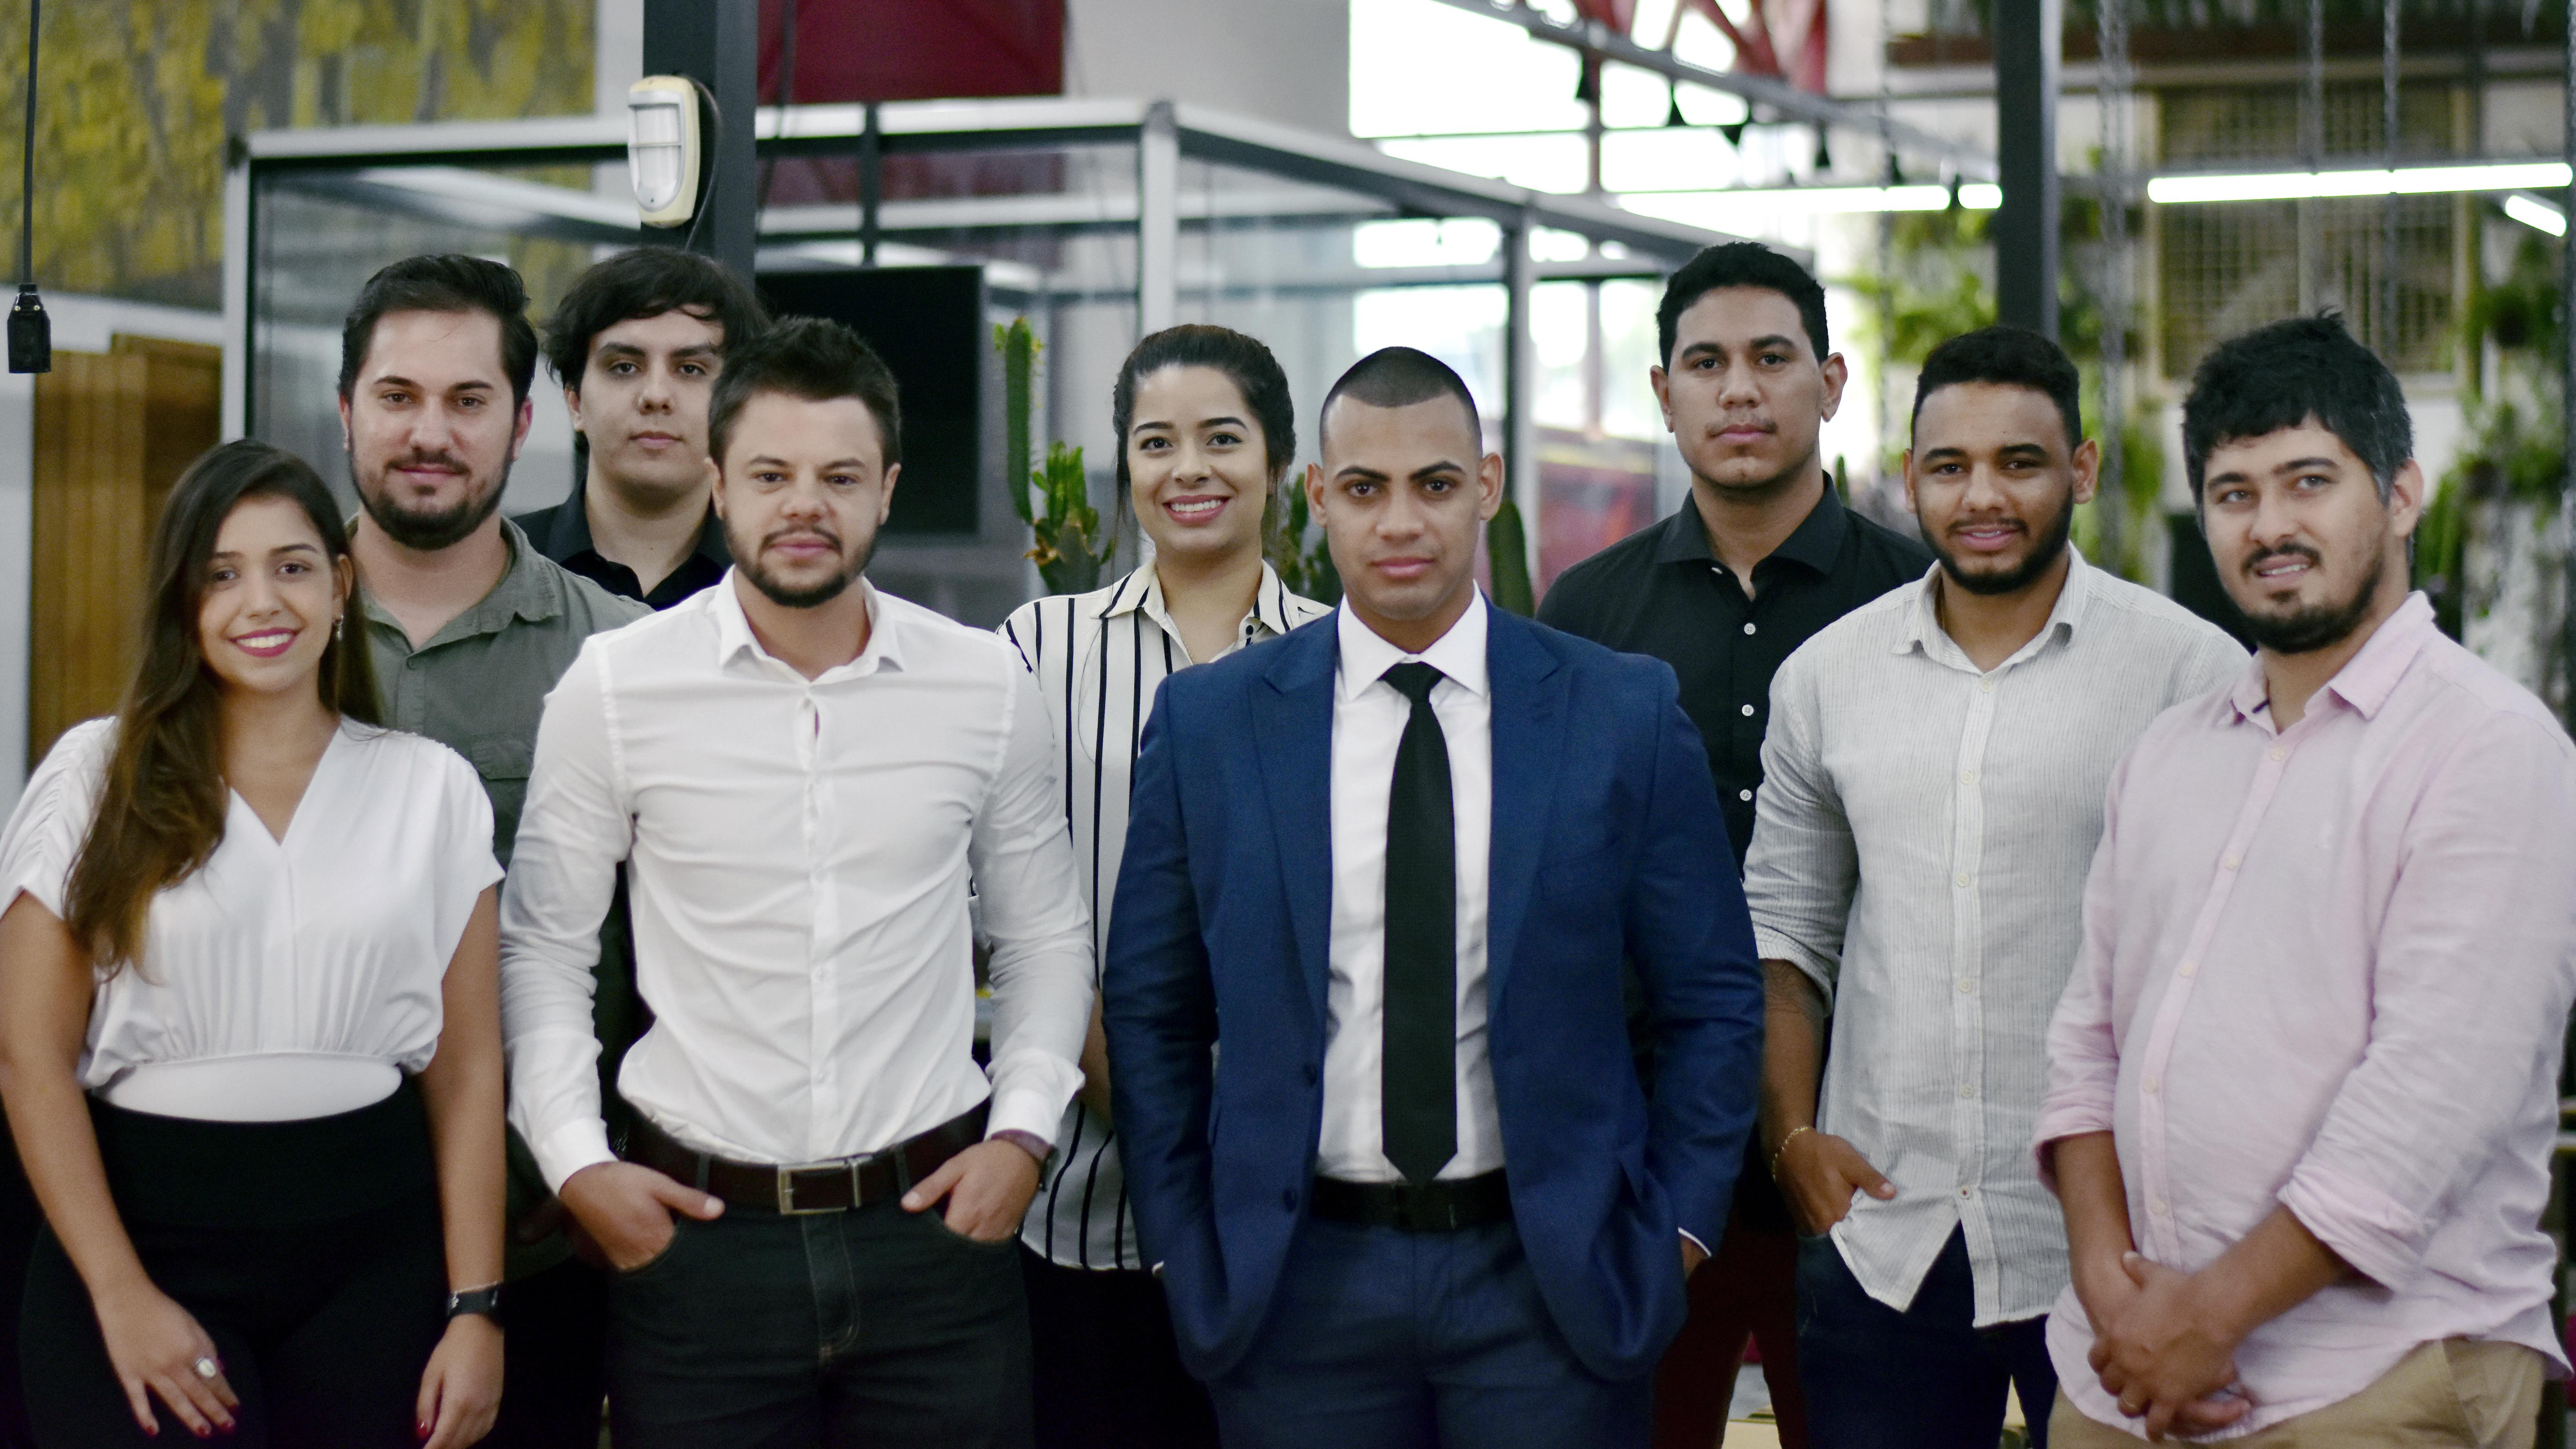 Equipes da CroSoften e da Harrison Investimentos em visita à sede da CroSoften em Uberlândia.